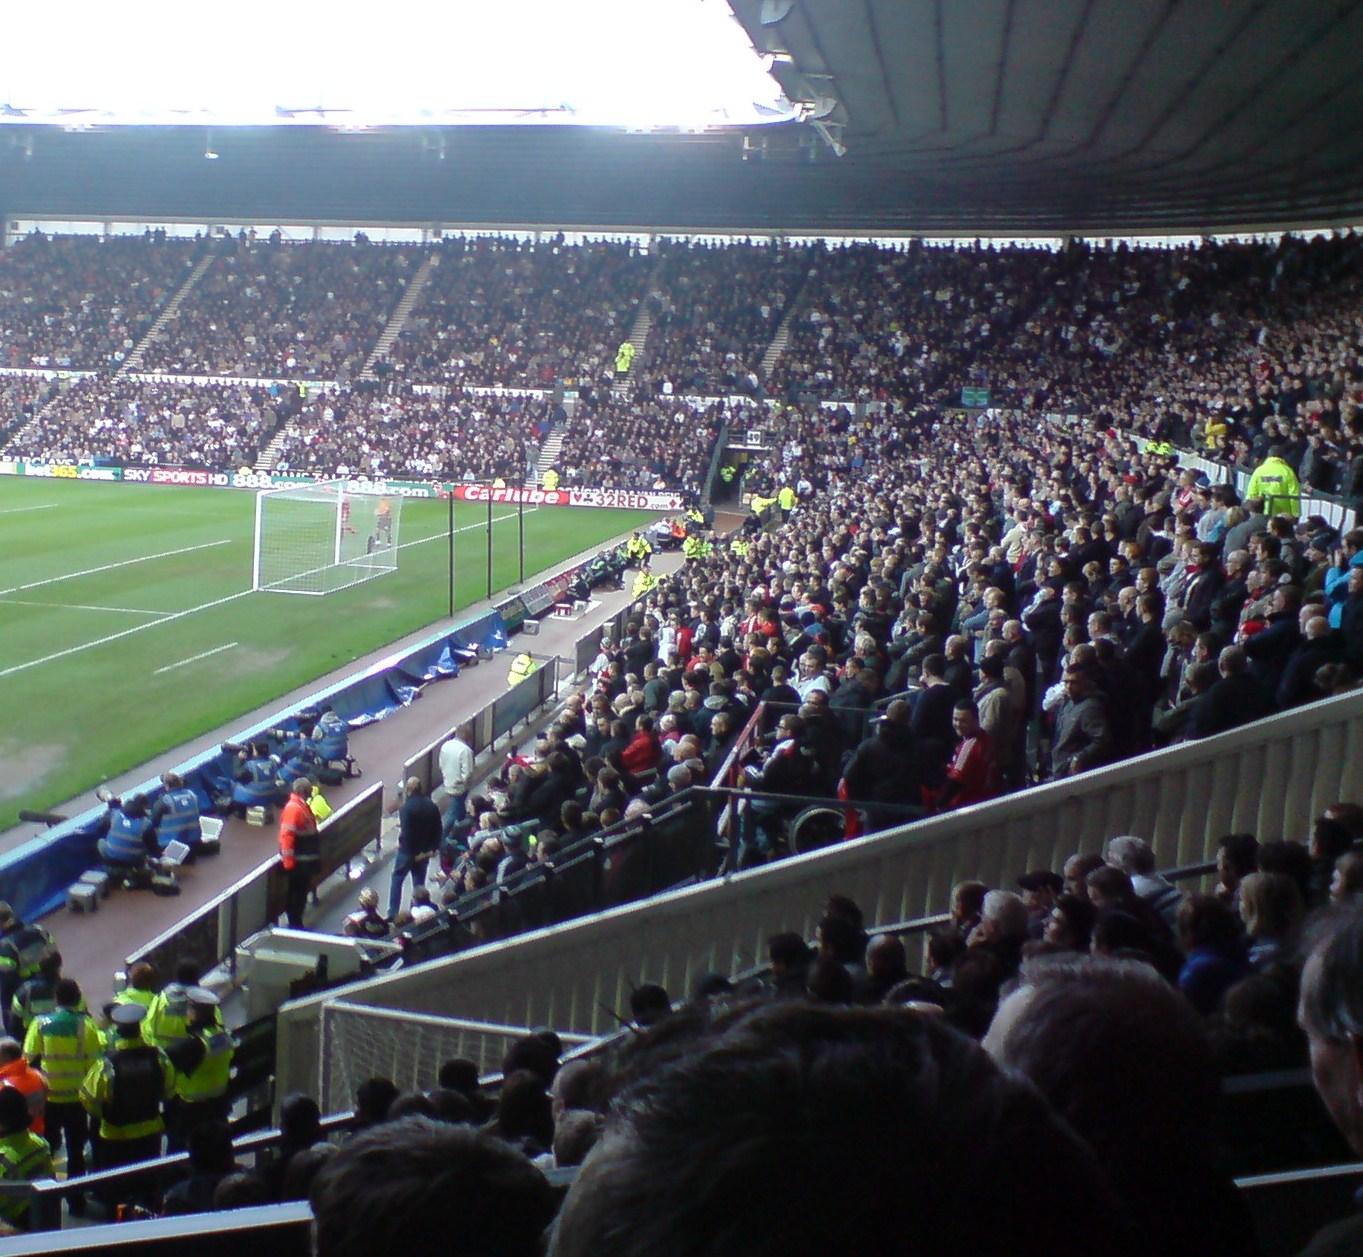 Pride_Park_Stadium_South_Stand